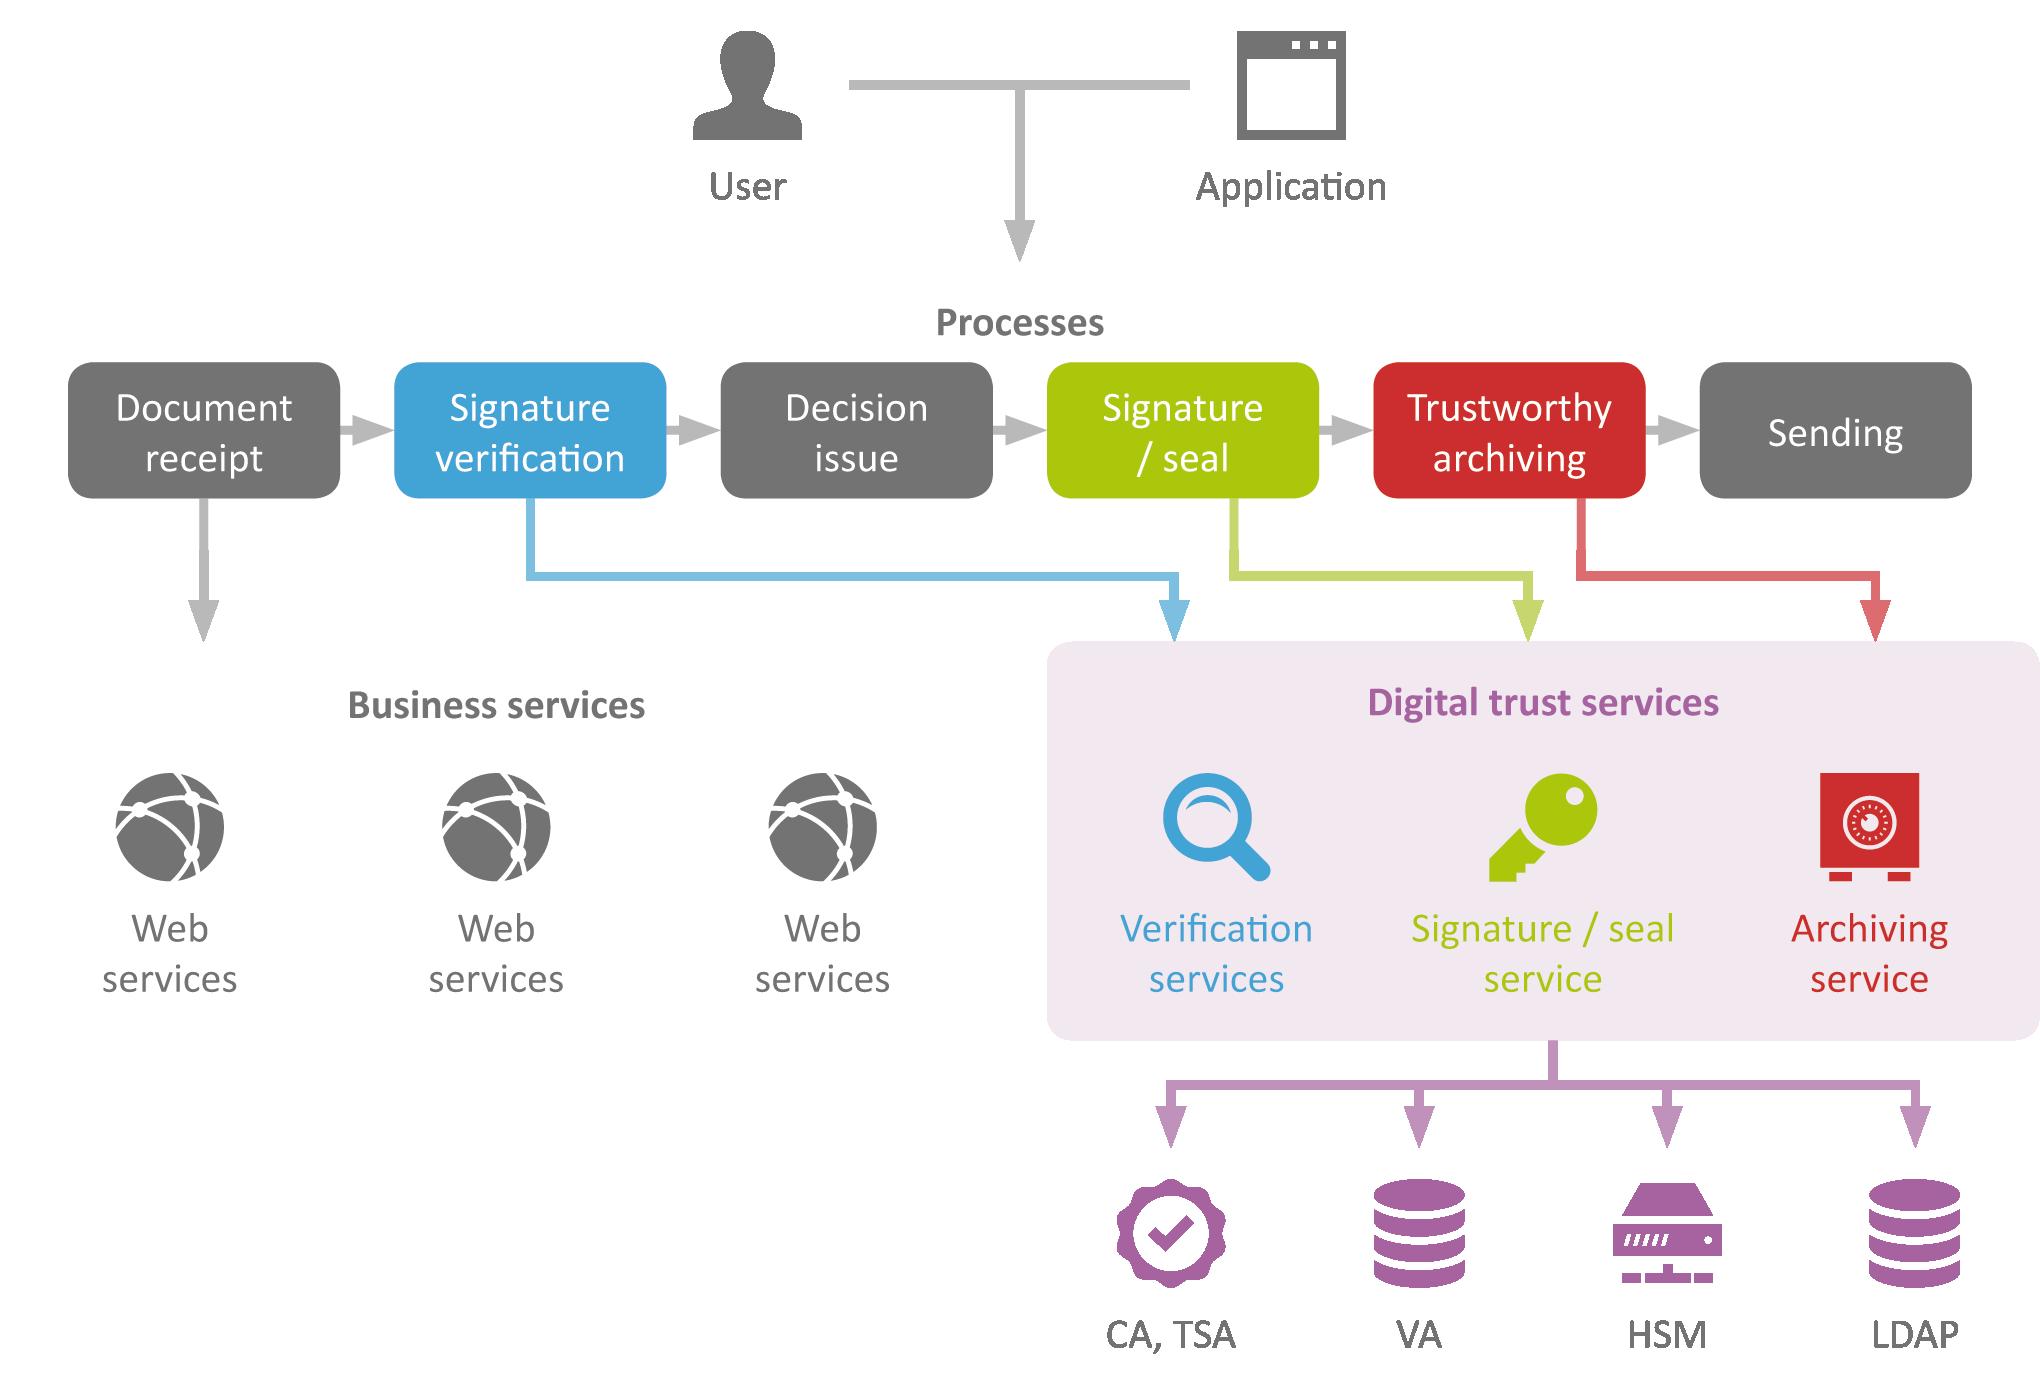 sefira-obelisk-trust-services-schema-en